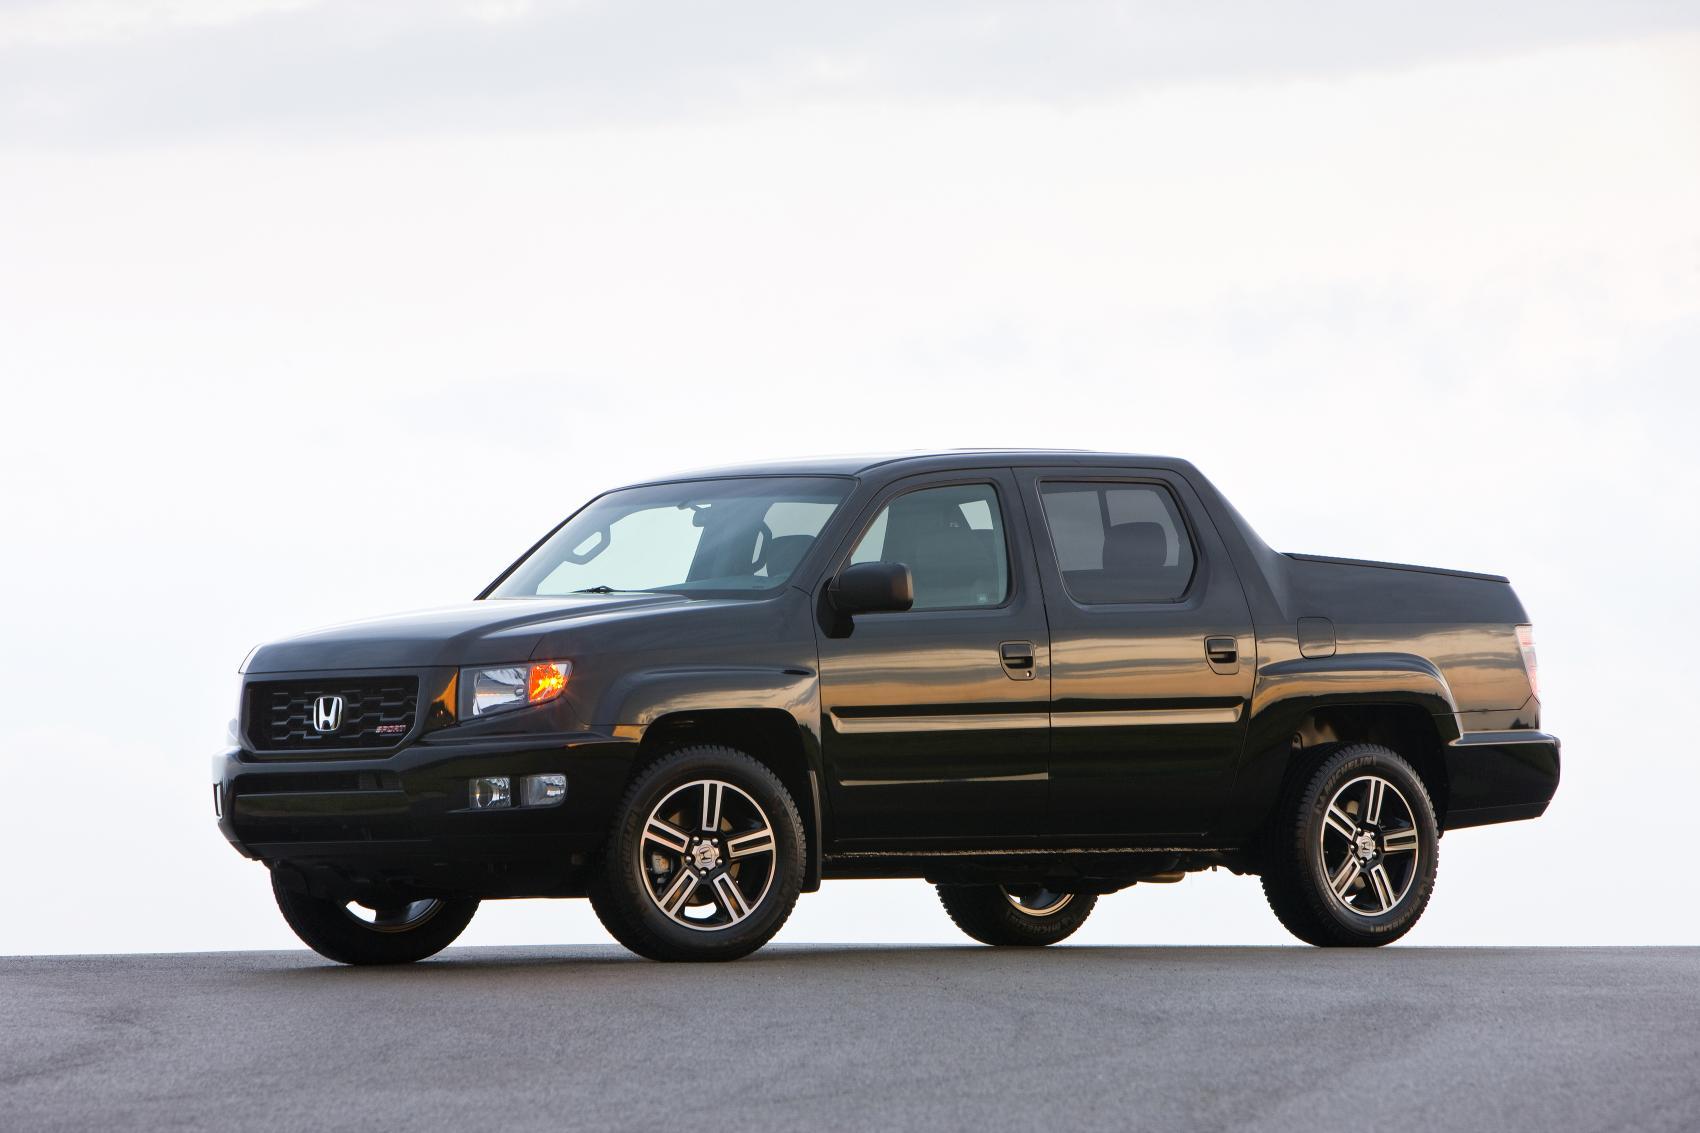 2014 Honda Ridgeline Pricing, New Special Edition Model Announced - autoevolution